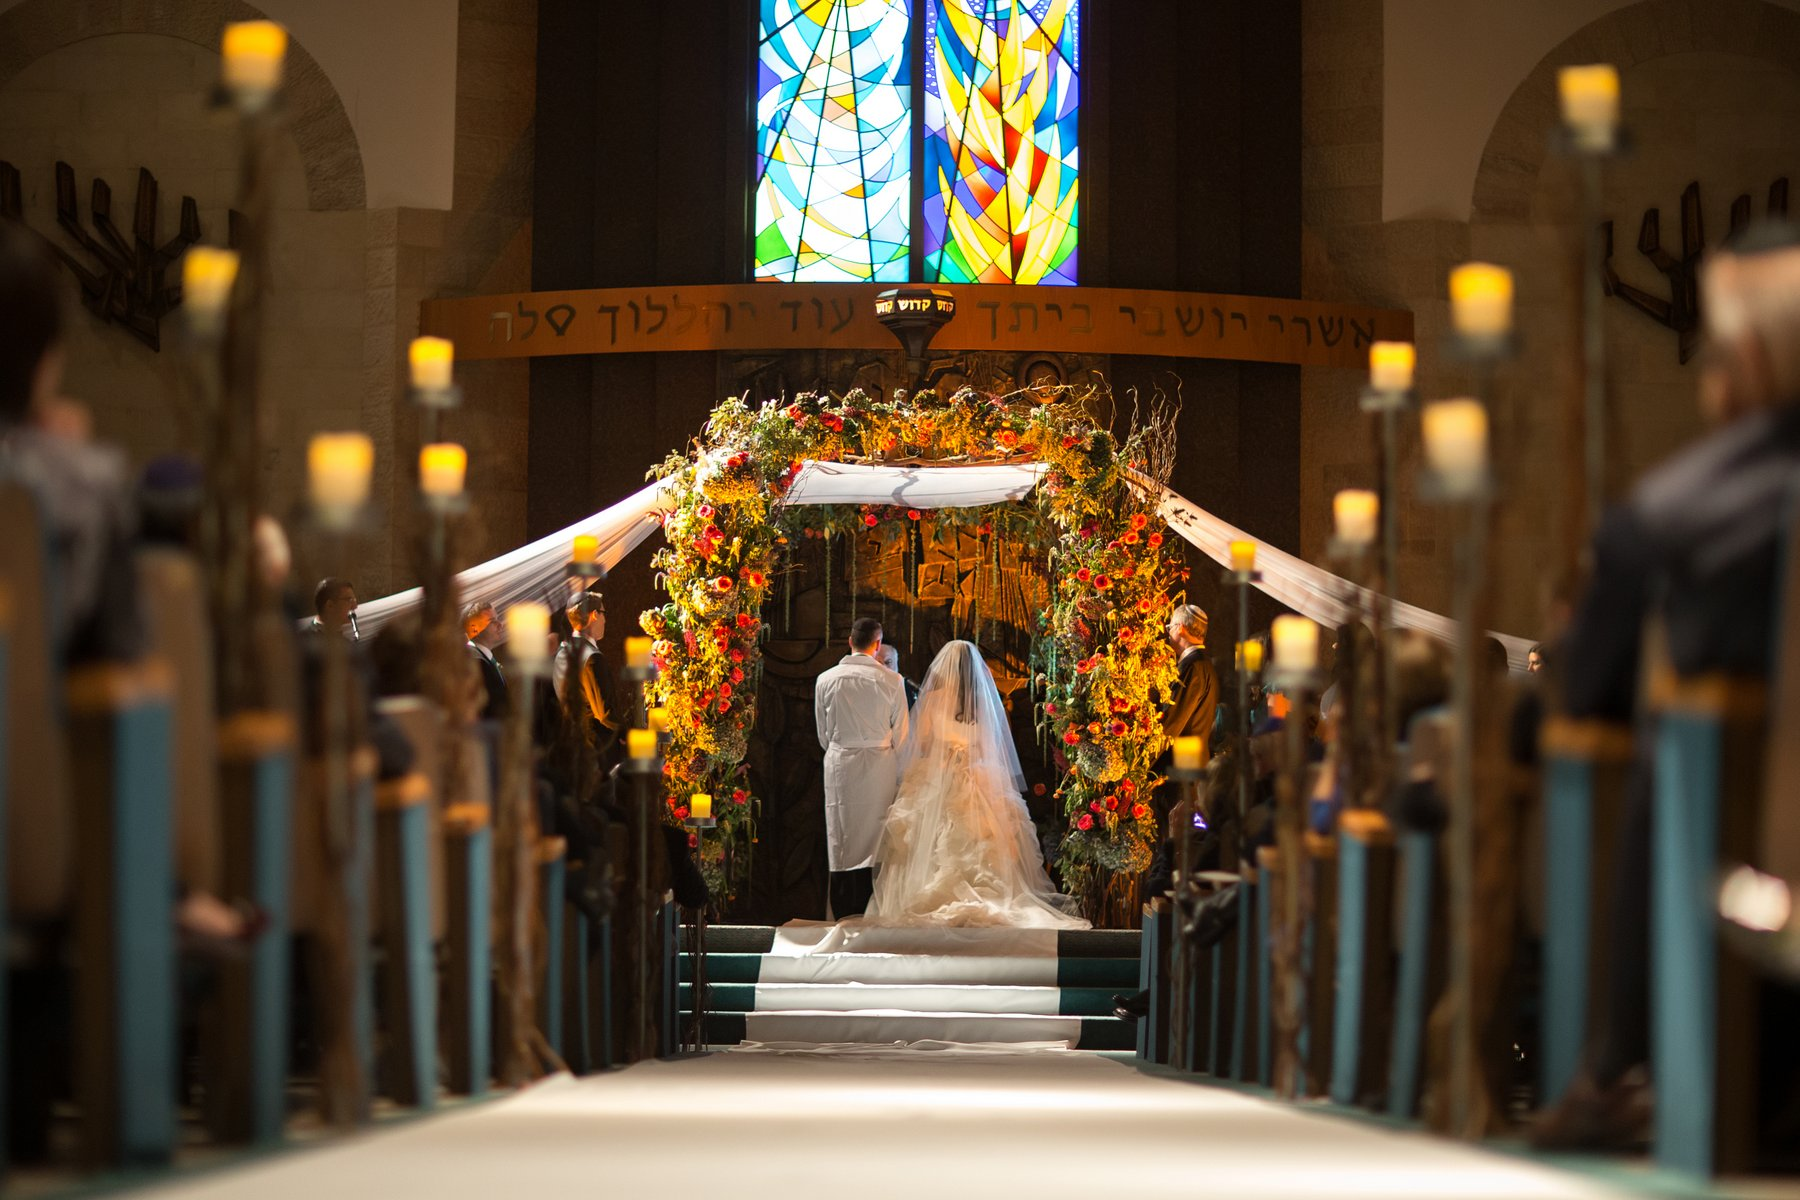 ortodox jewish wedding ceremony photos